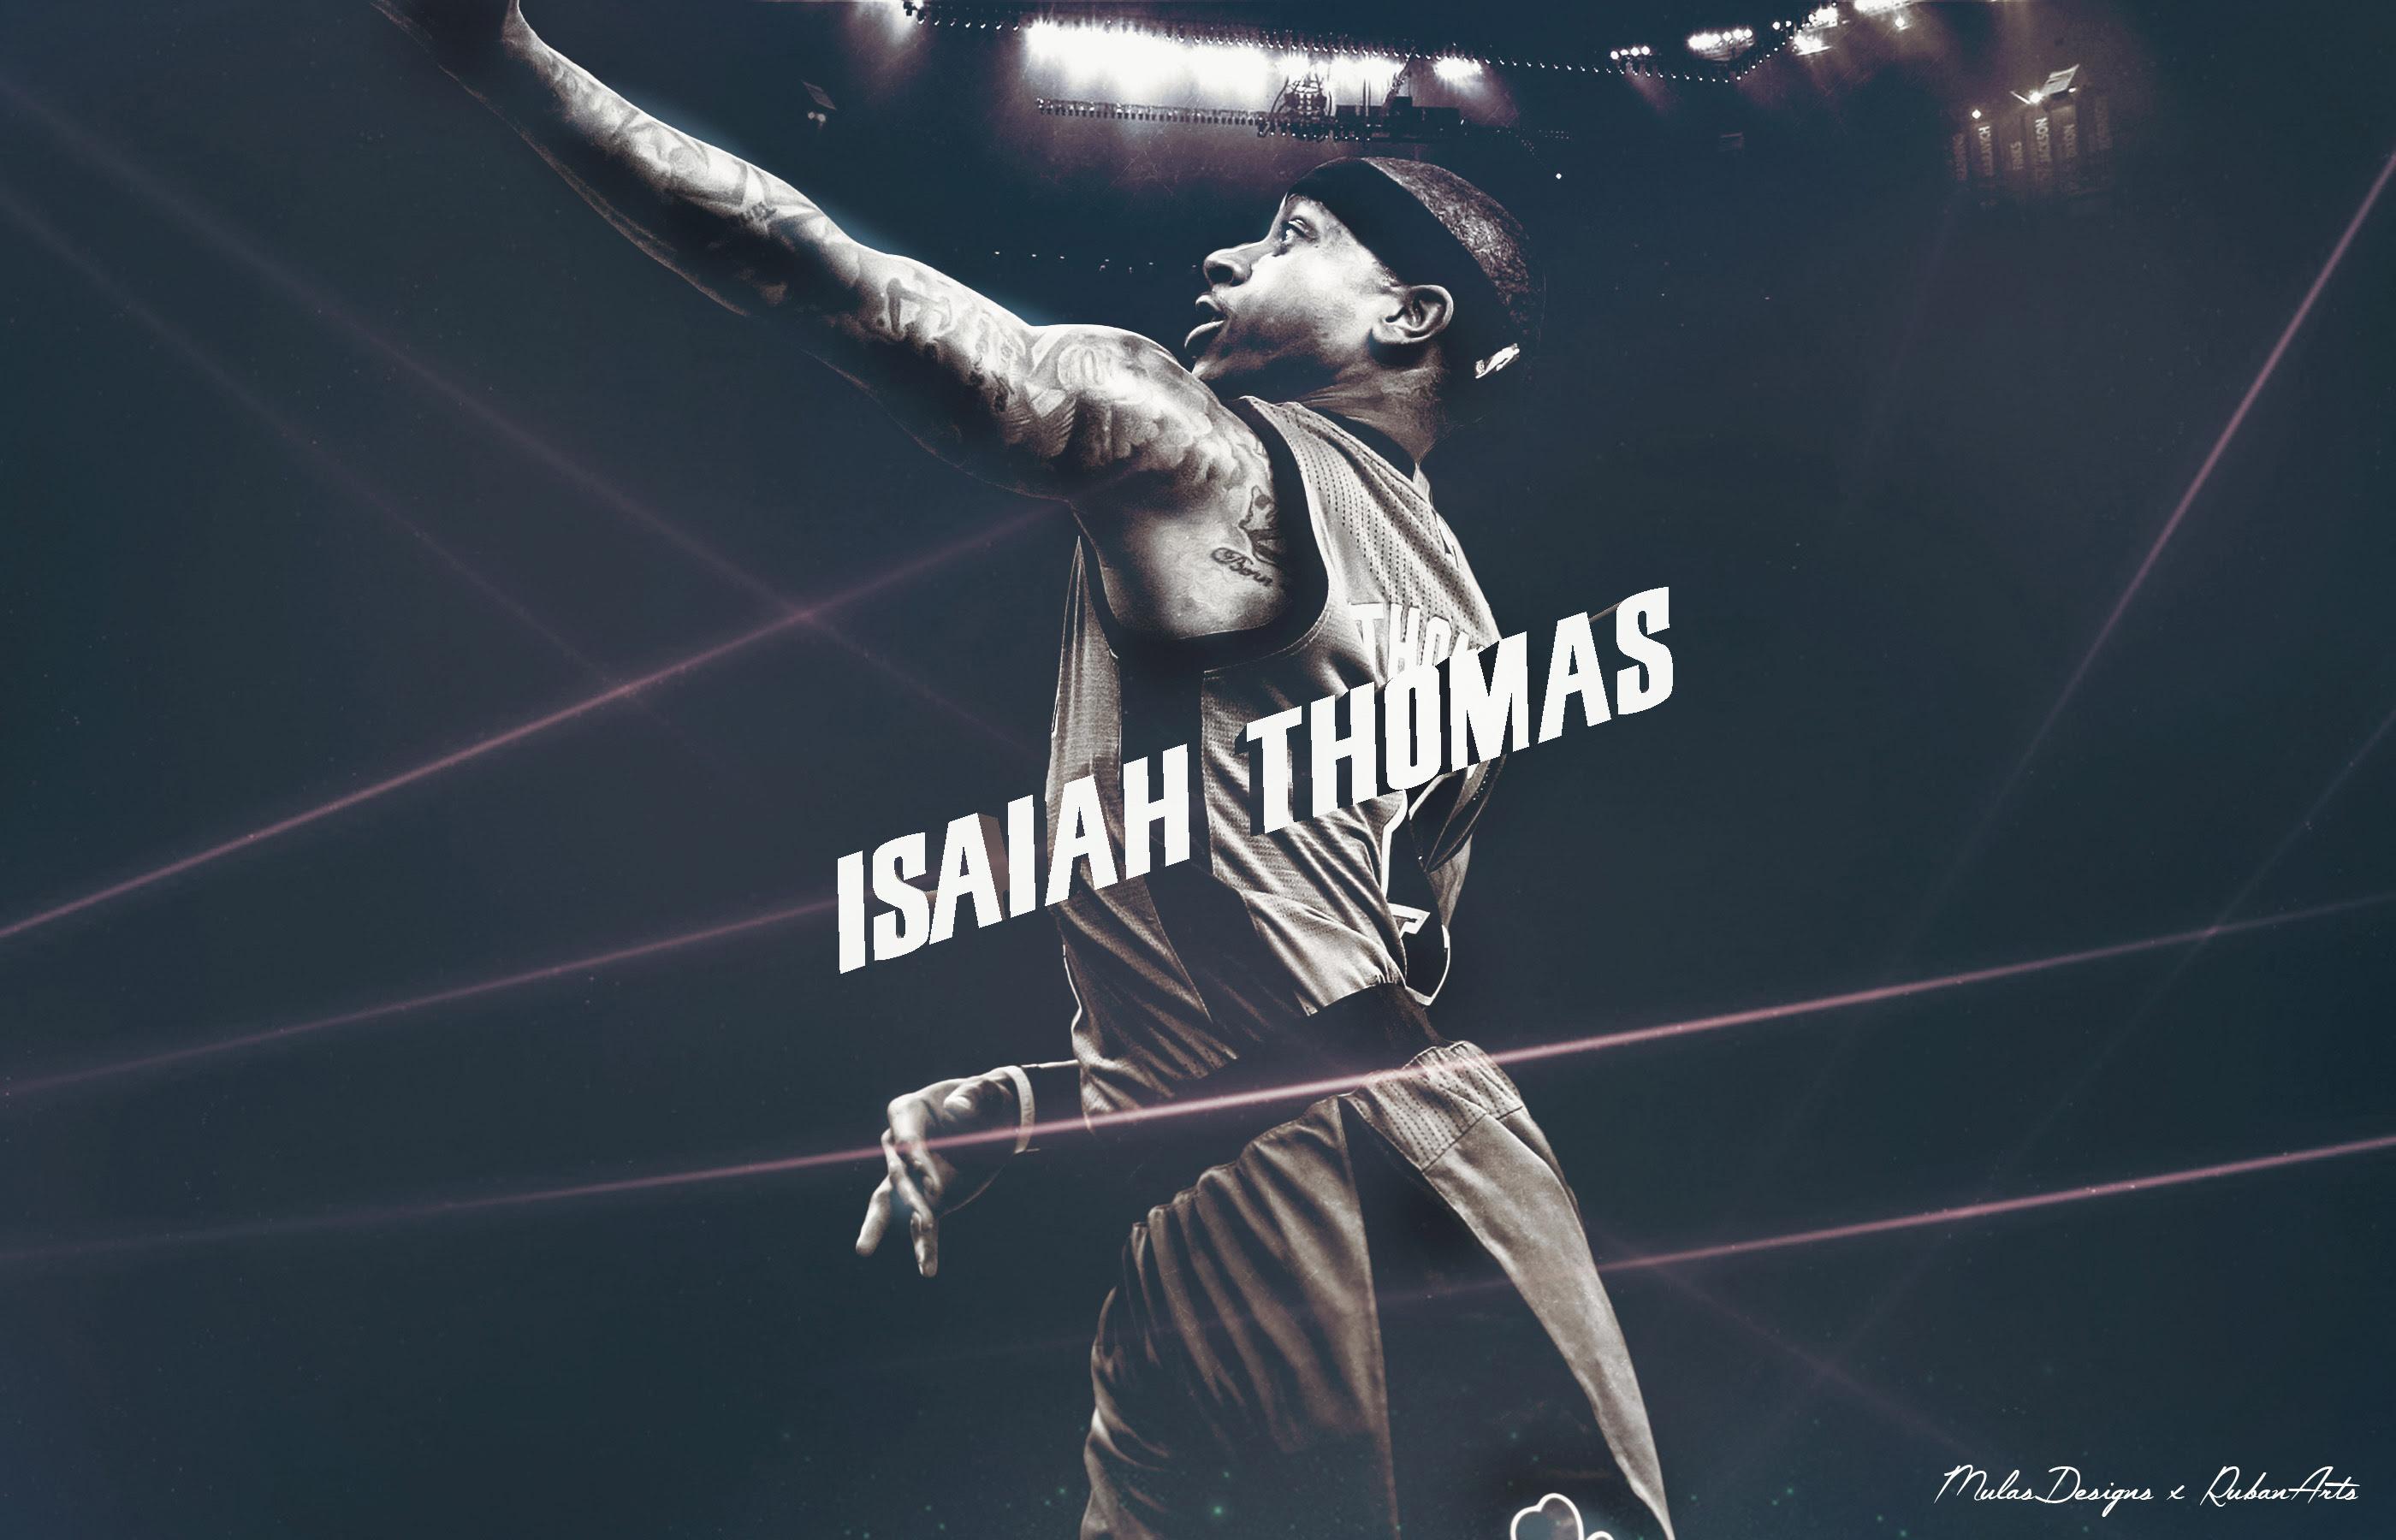 Boston Celtics Wallpapers Basketball Wallpapers At